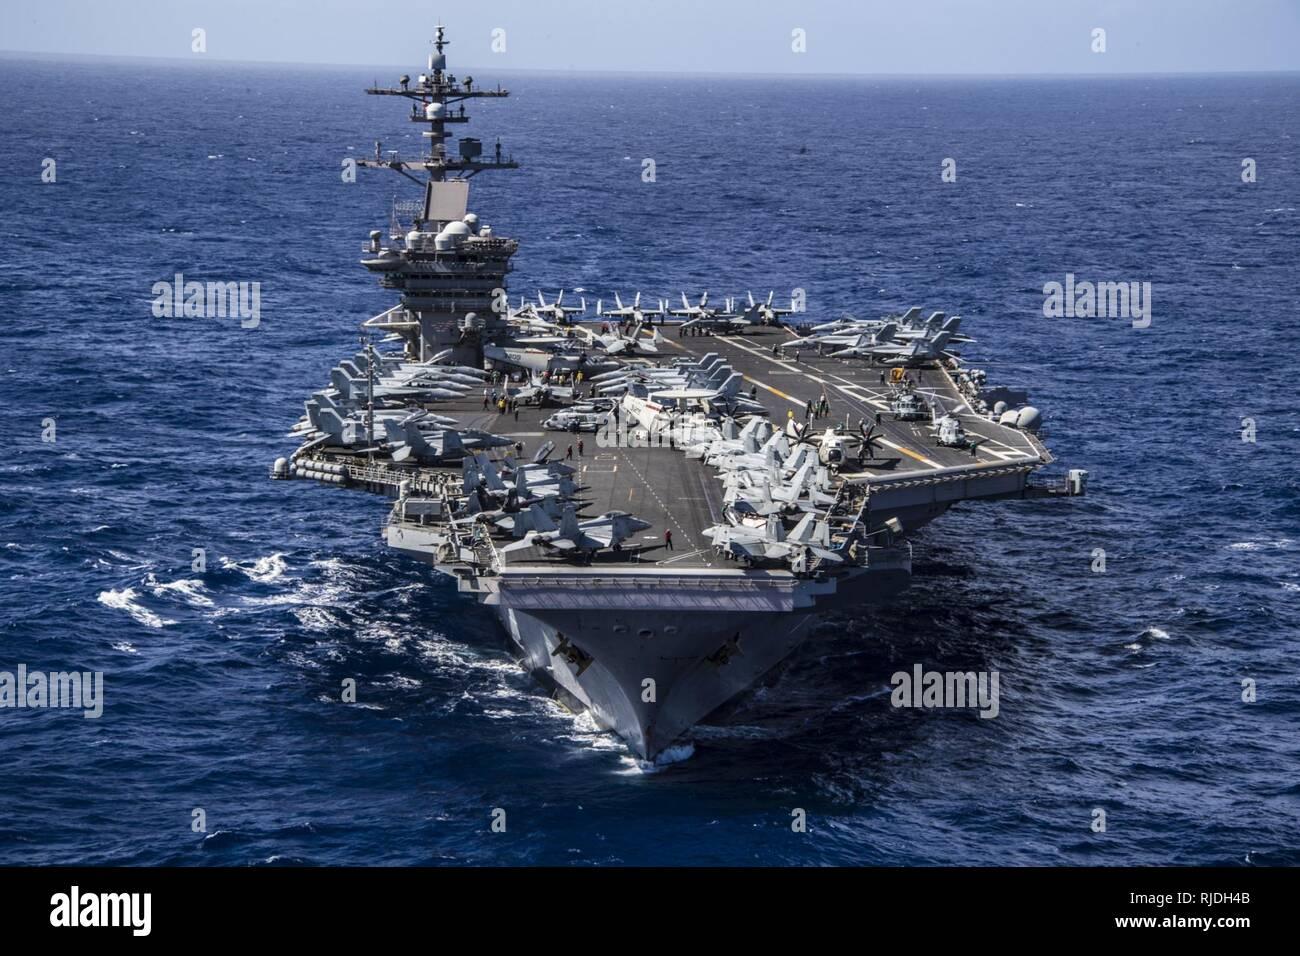 Uss Nimitz Deployment Schedule 2019 PACIFIC OCEAN (Jan. 19, 2018) The Nimitz class aircraft carrier